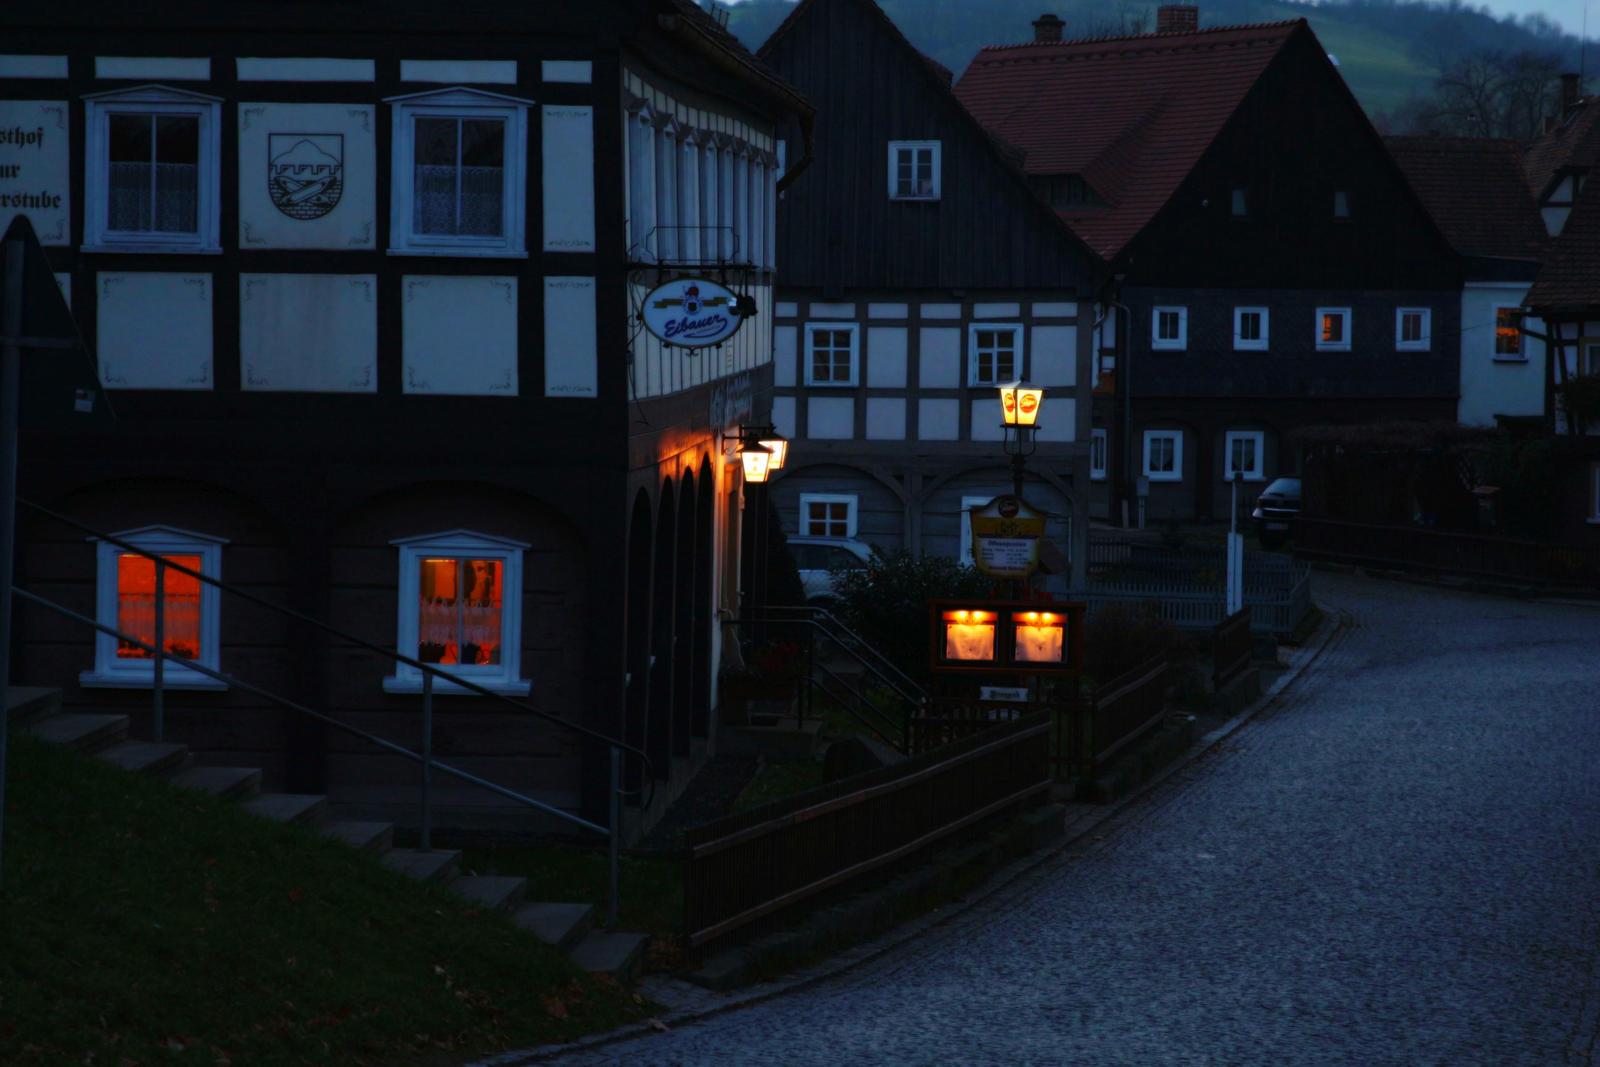 Street of Grosschoenau, Germany by LoveForDetails